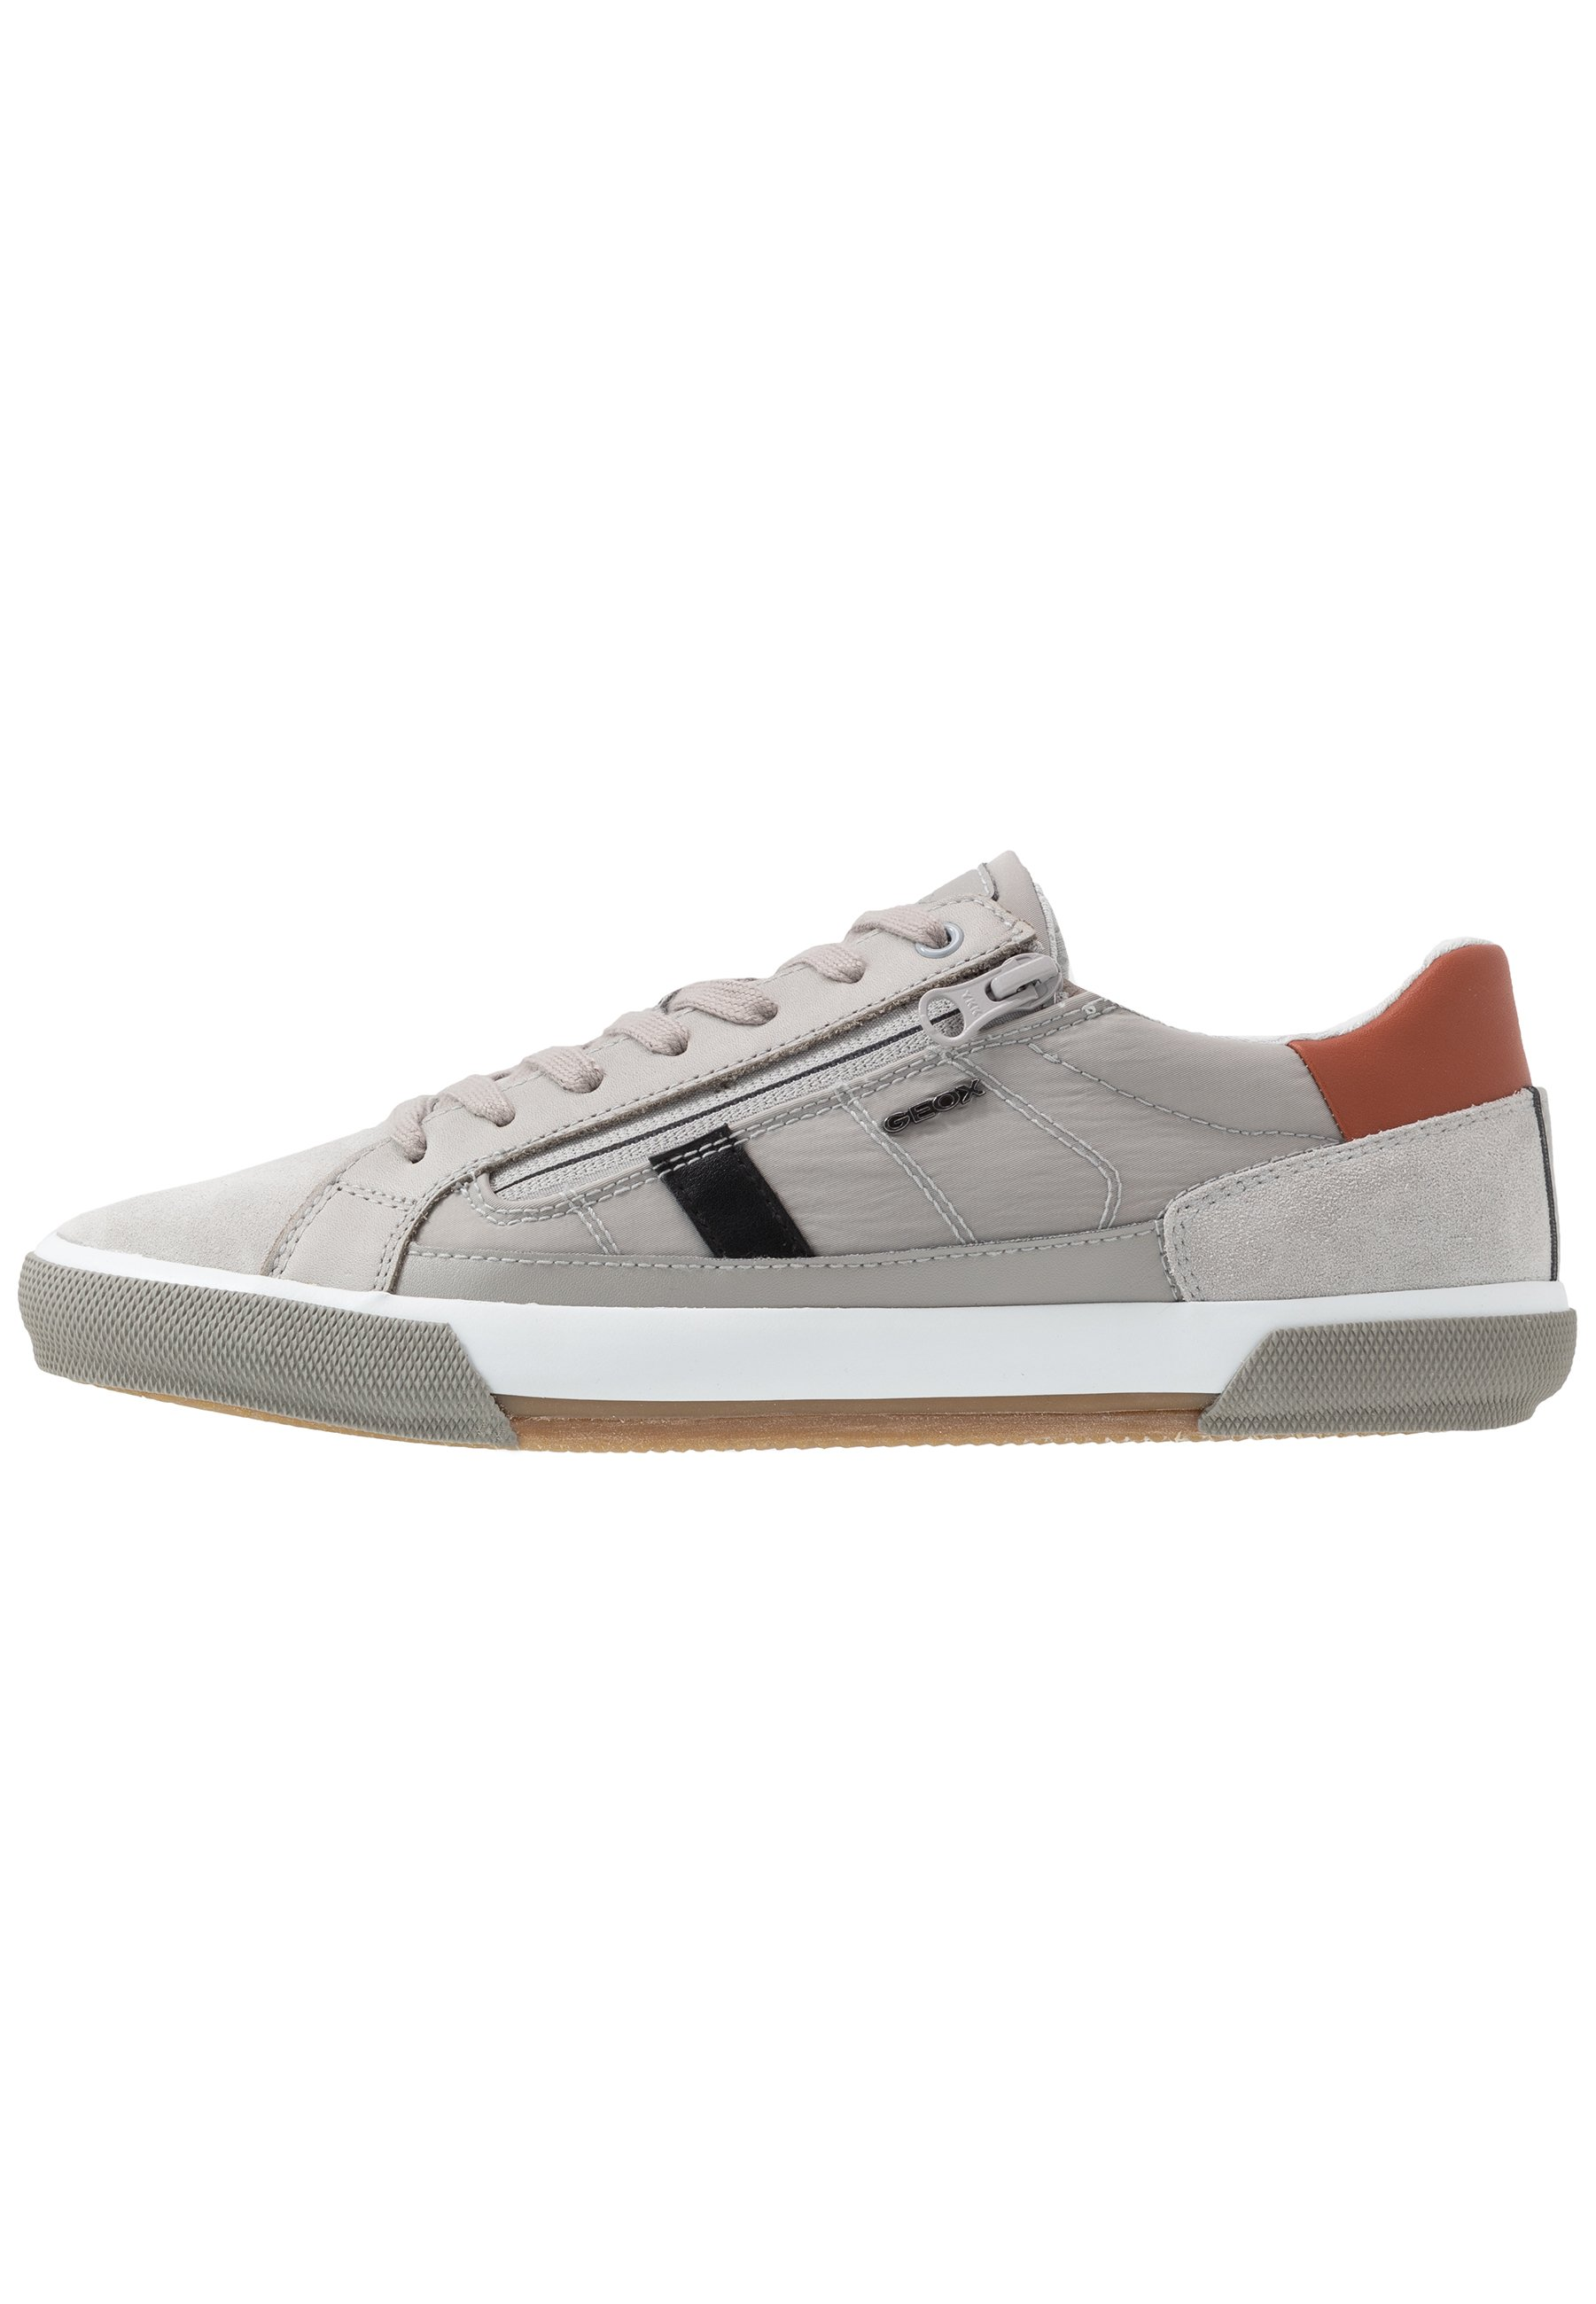 Geox UOMO SNAKE Sneaker low light greygrey